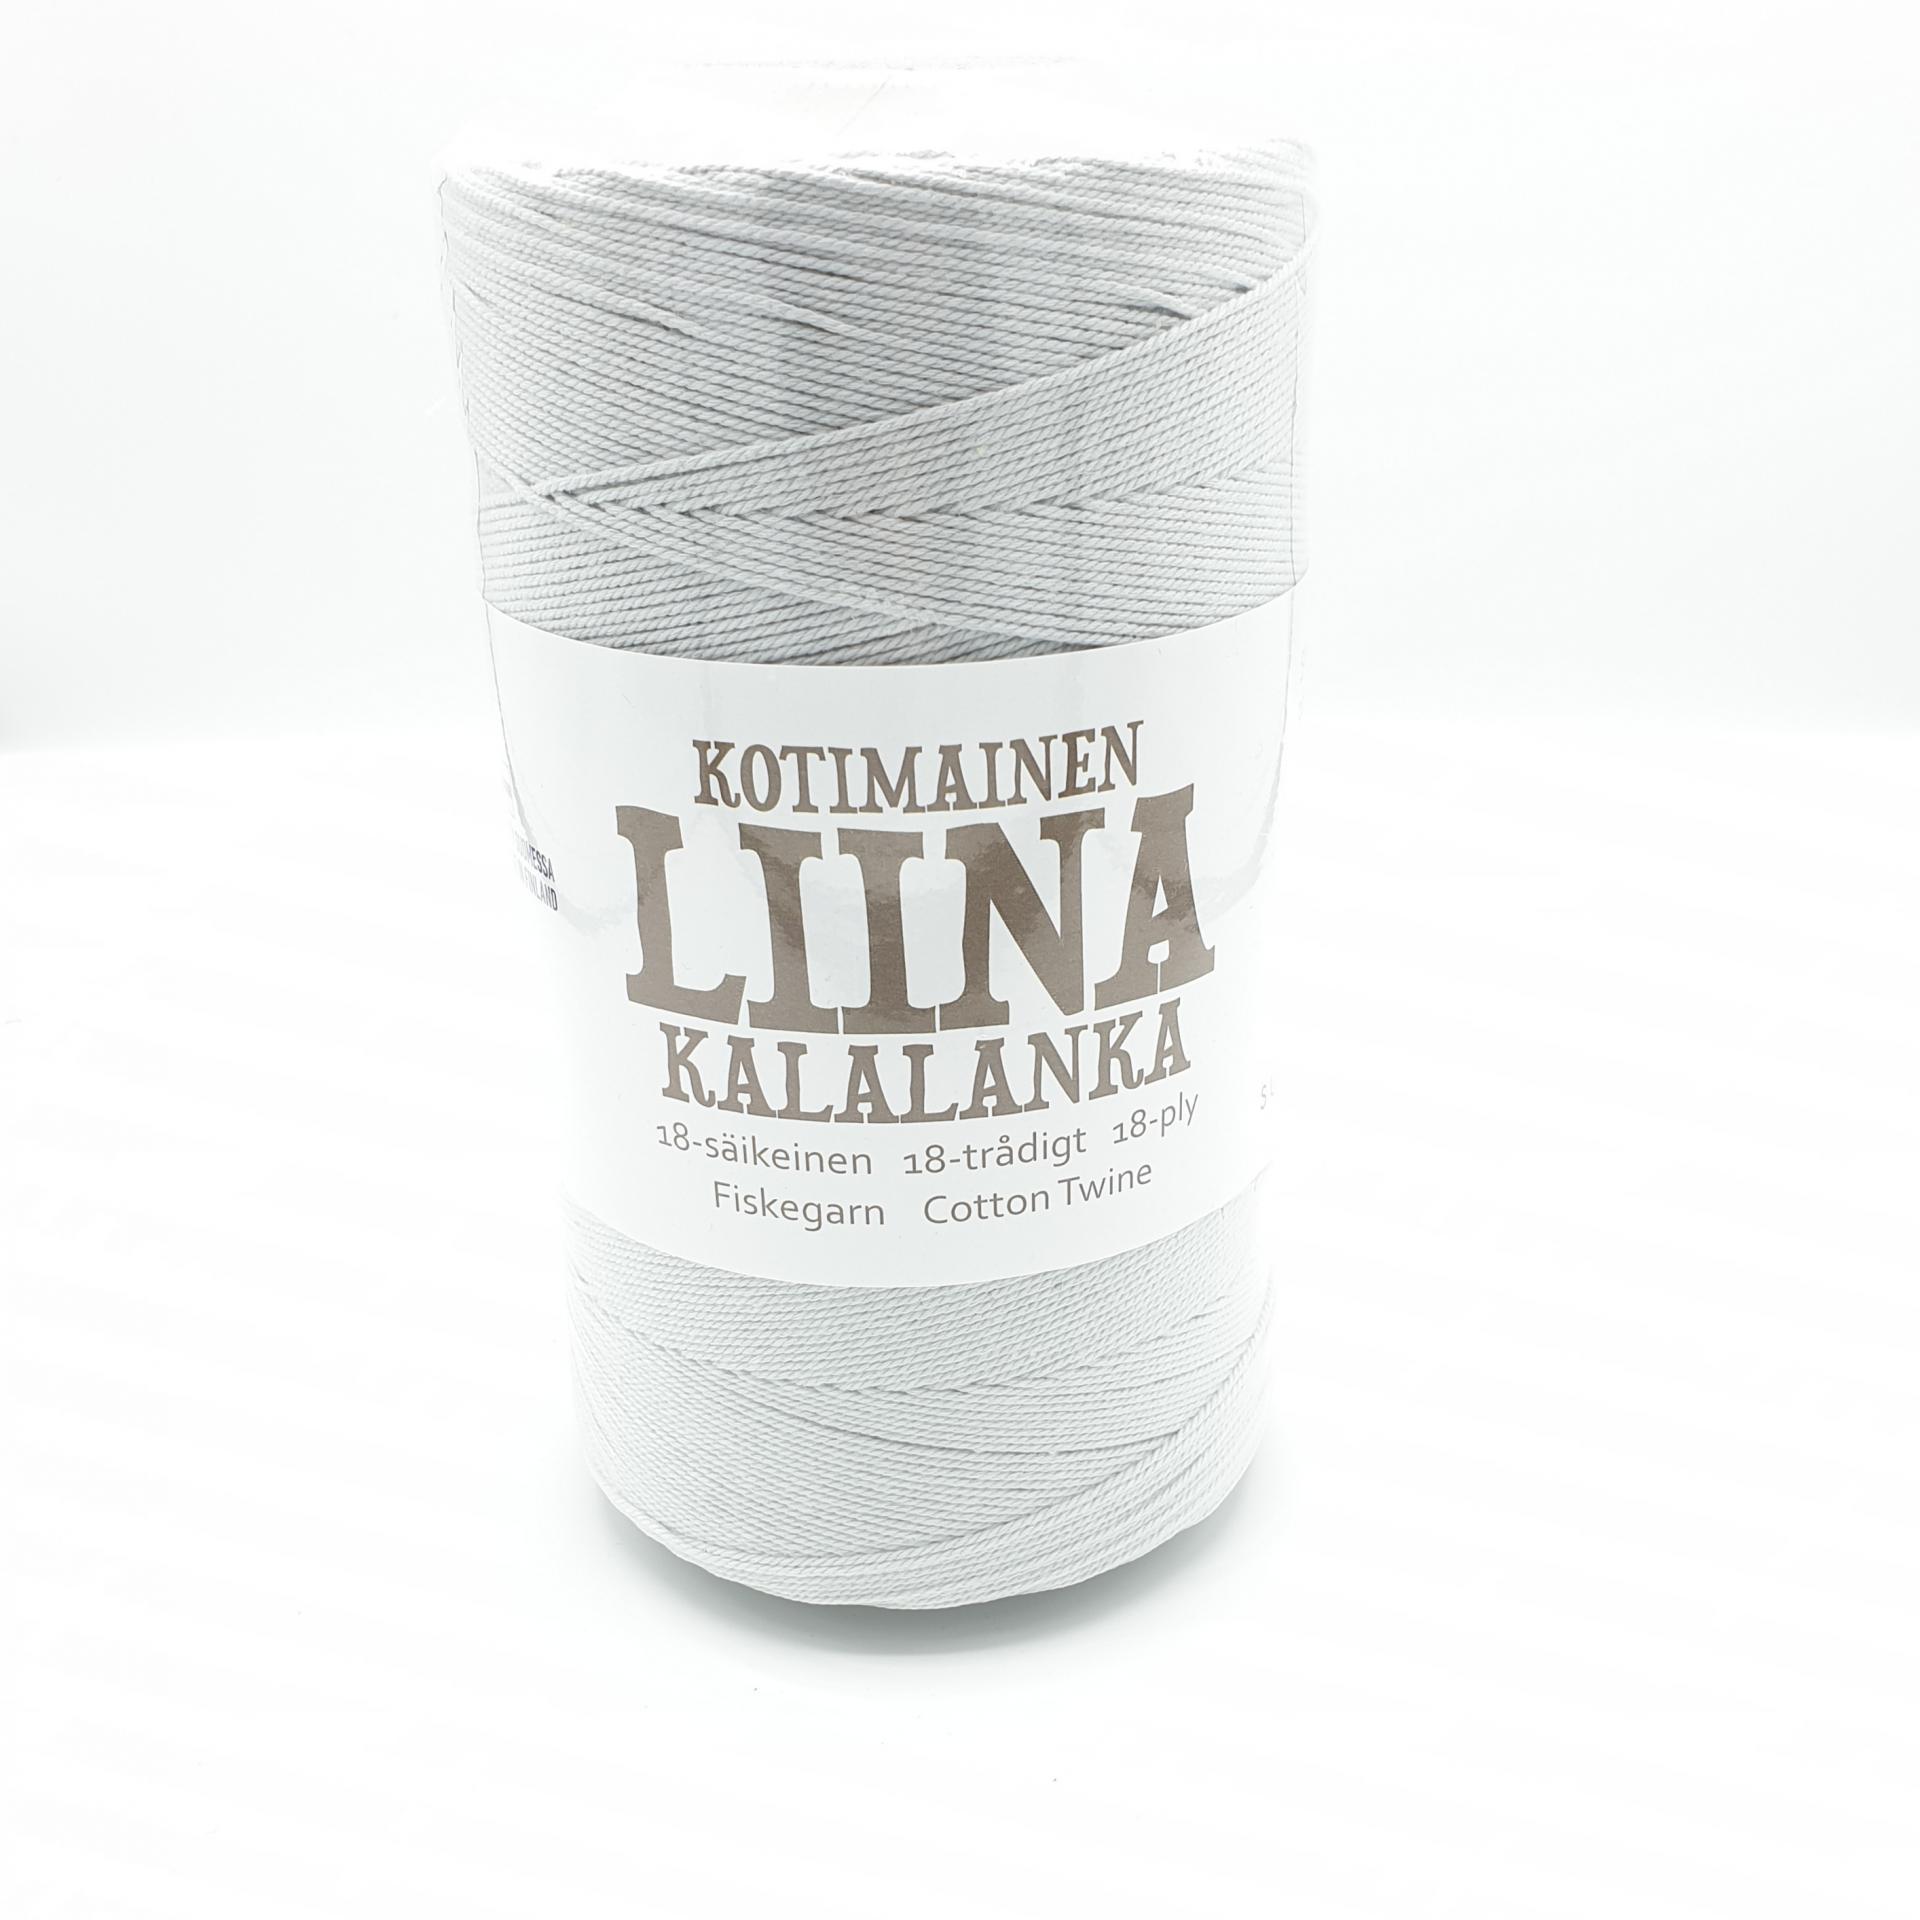 Cono algodón - Liina Kalalanka - Molla Mills - Gris Perla